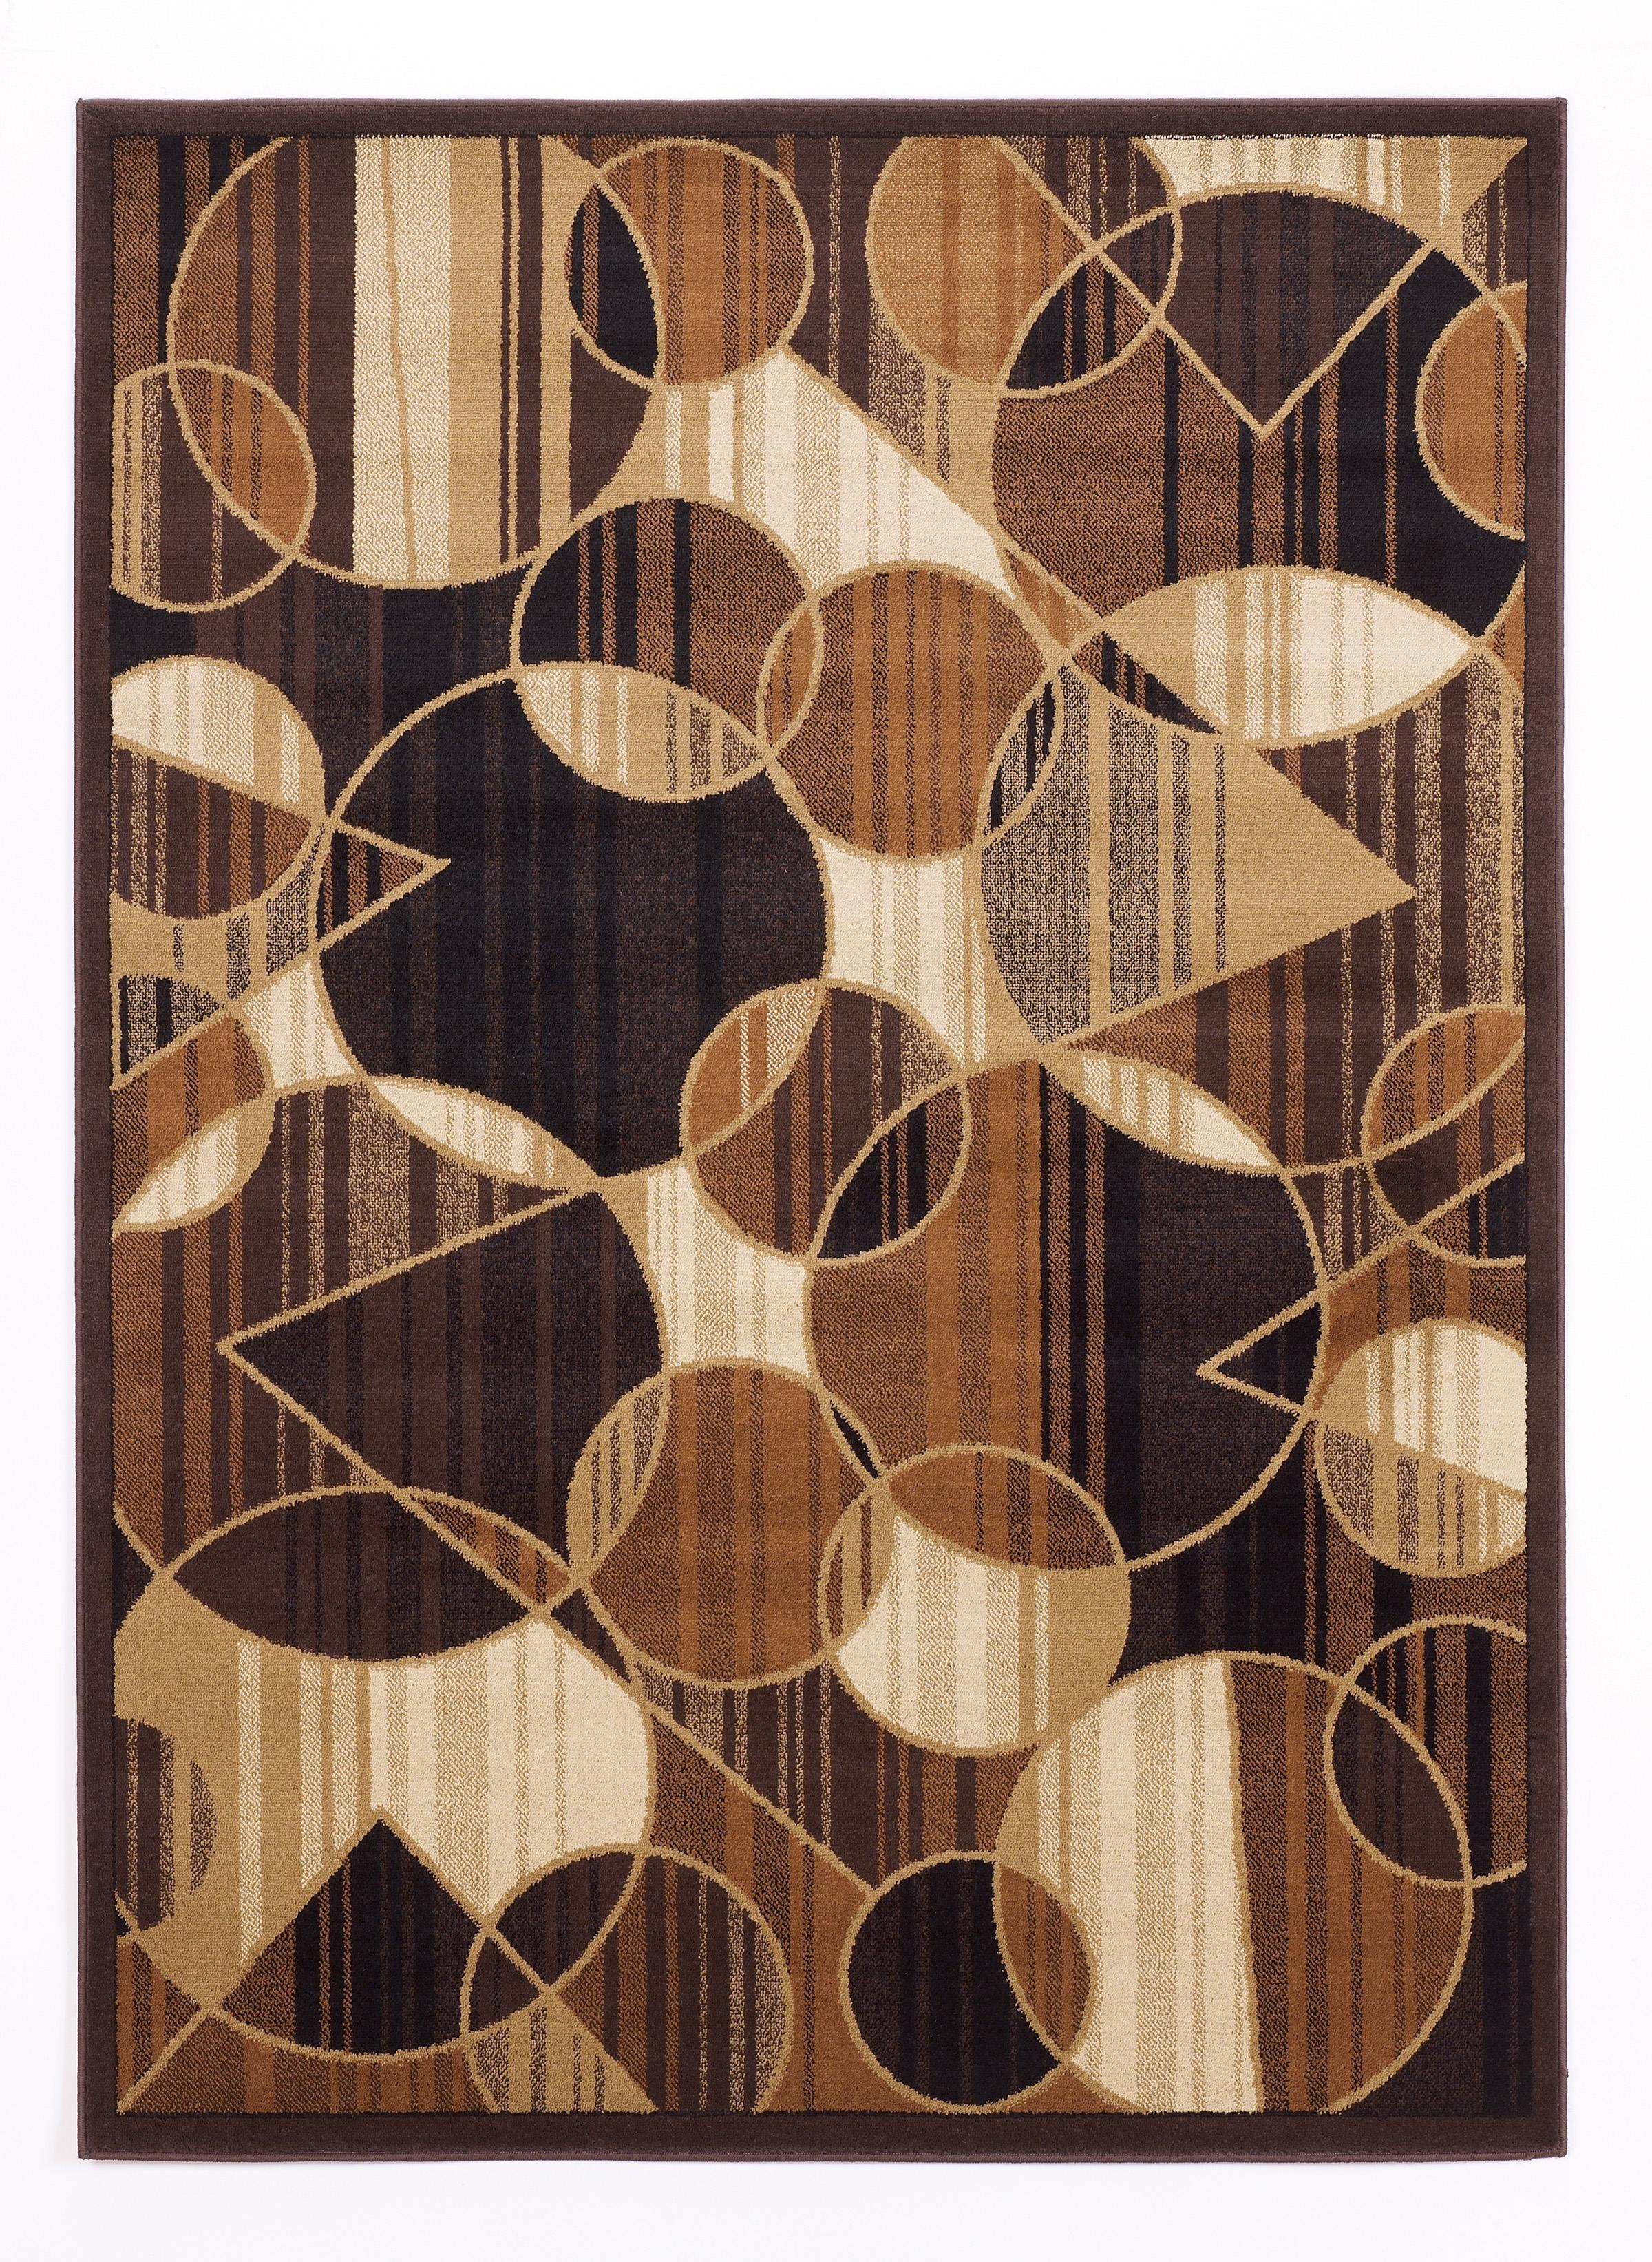 Contemporary Area Rugs Calder - Multi Rug by Ashley Furniture Signature Design at Del Sol Furniture